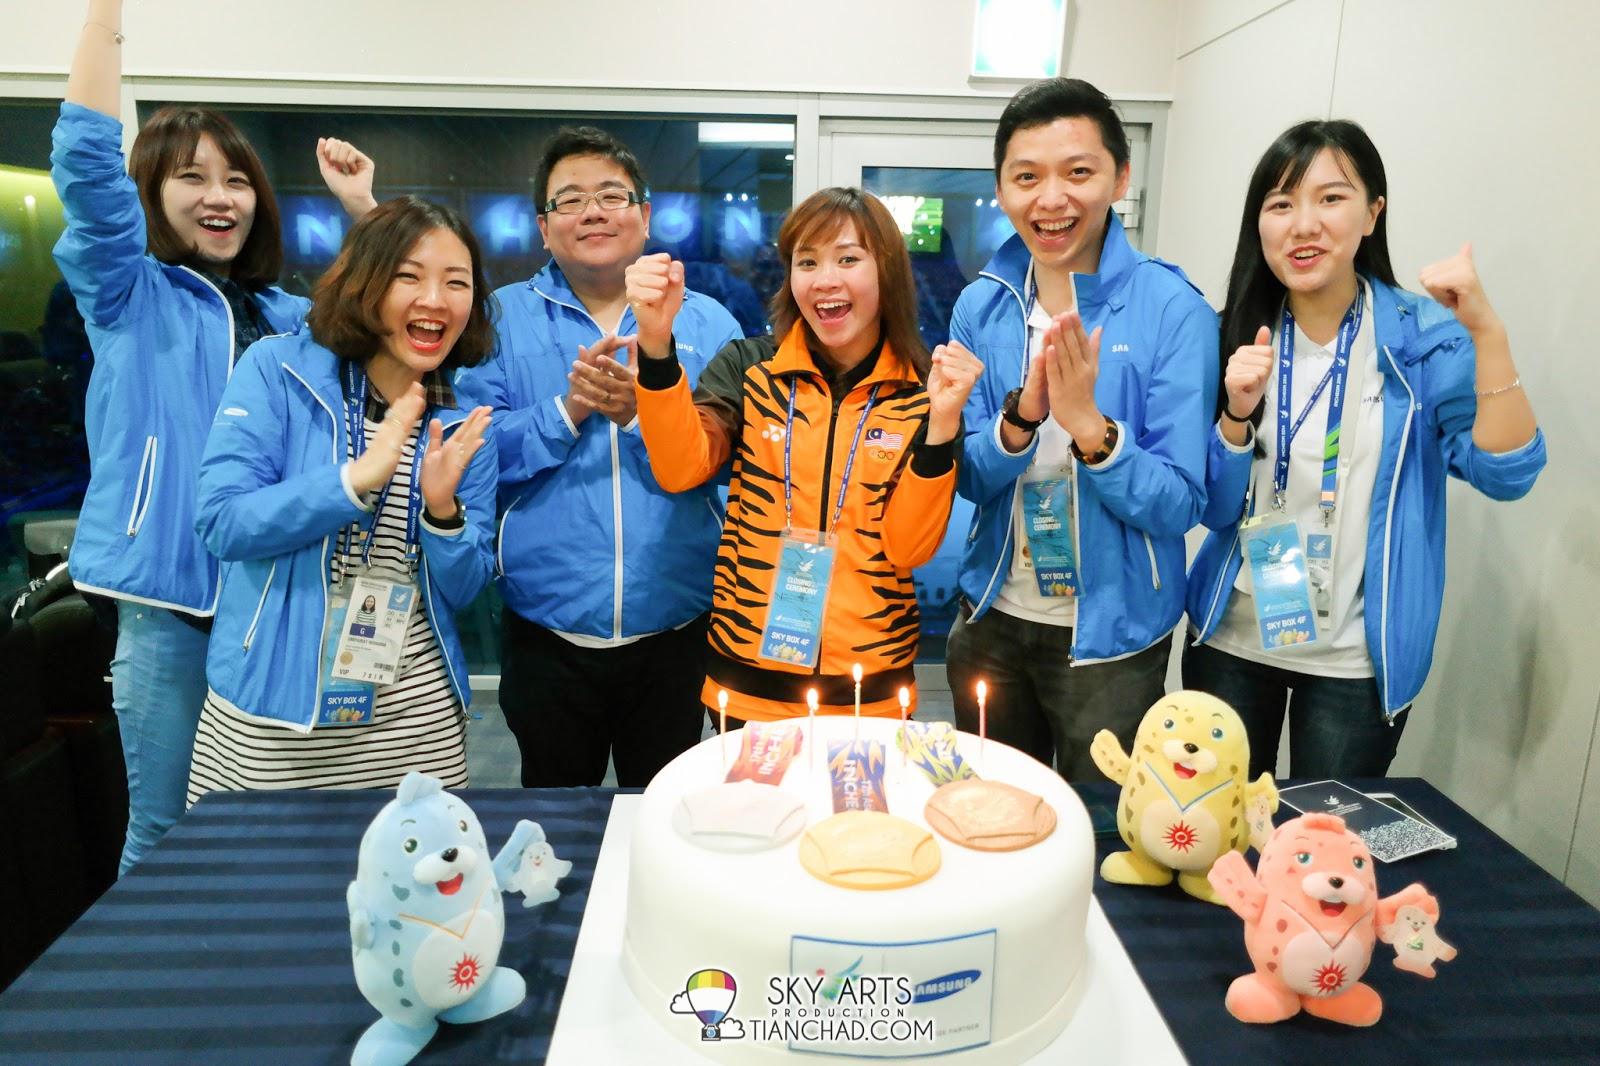 http://1.bp.blogspot.com/-b1MsfCXcpFQ/VDOeIYYITMI/AAAAAAAB8hE/WKpscp0T_bw/s1600/Incheon-Asian-Games-2014-Closing-Ceremony-TianChad.com-5169.jpg